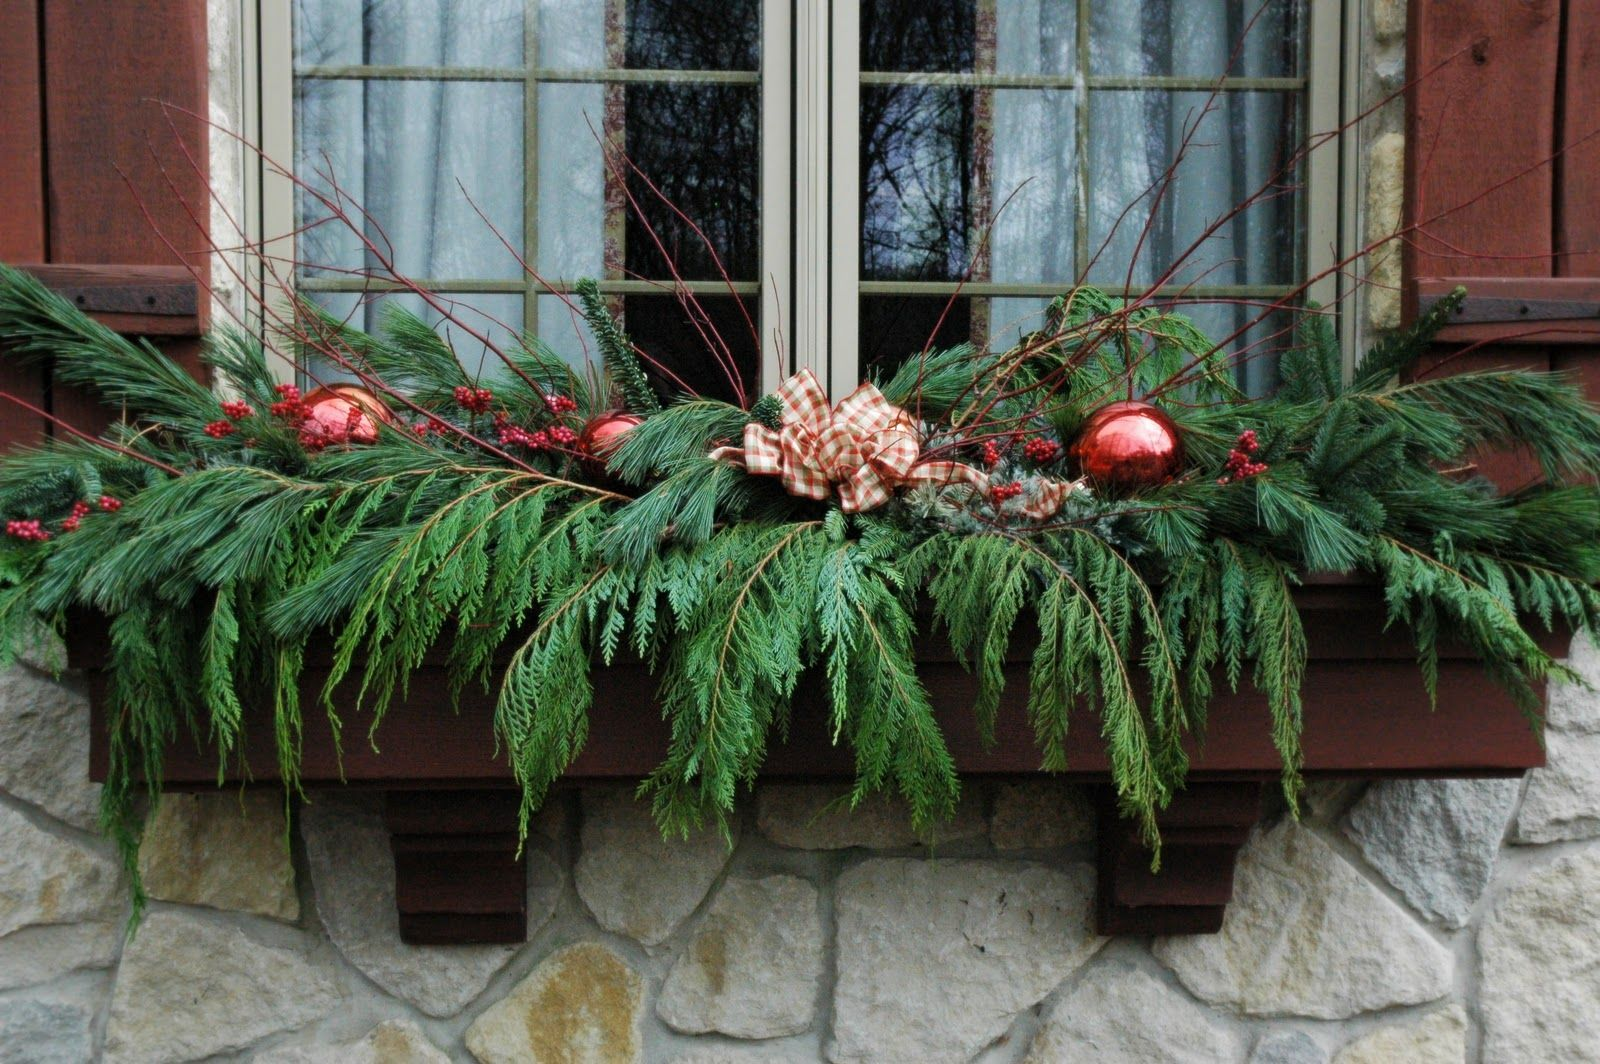 window decorations | Holiday Decorating | Pinterest | Christmas ...